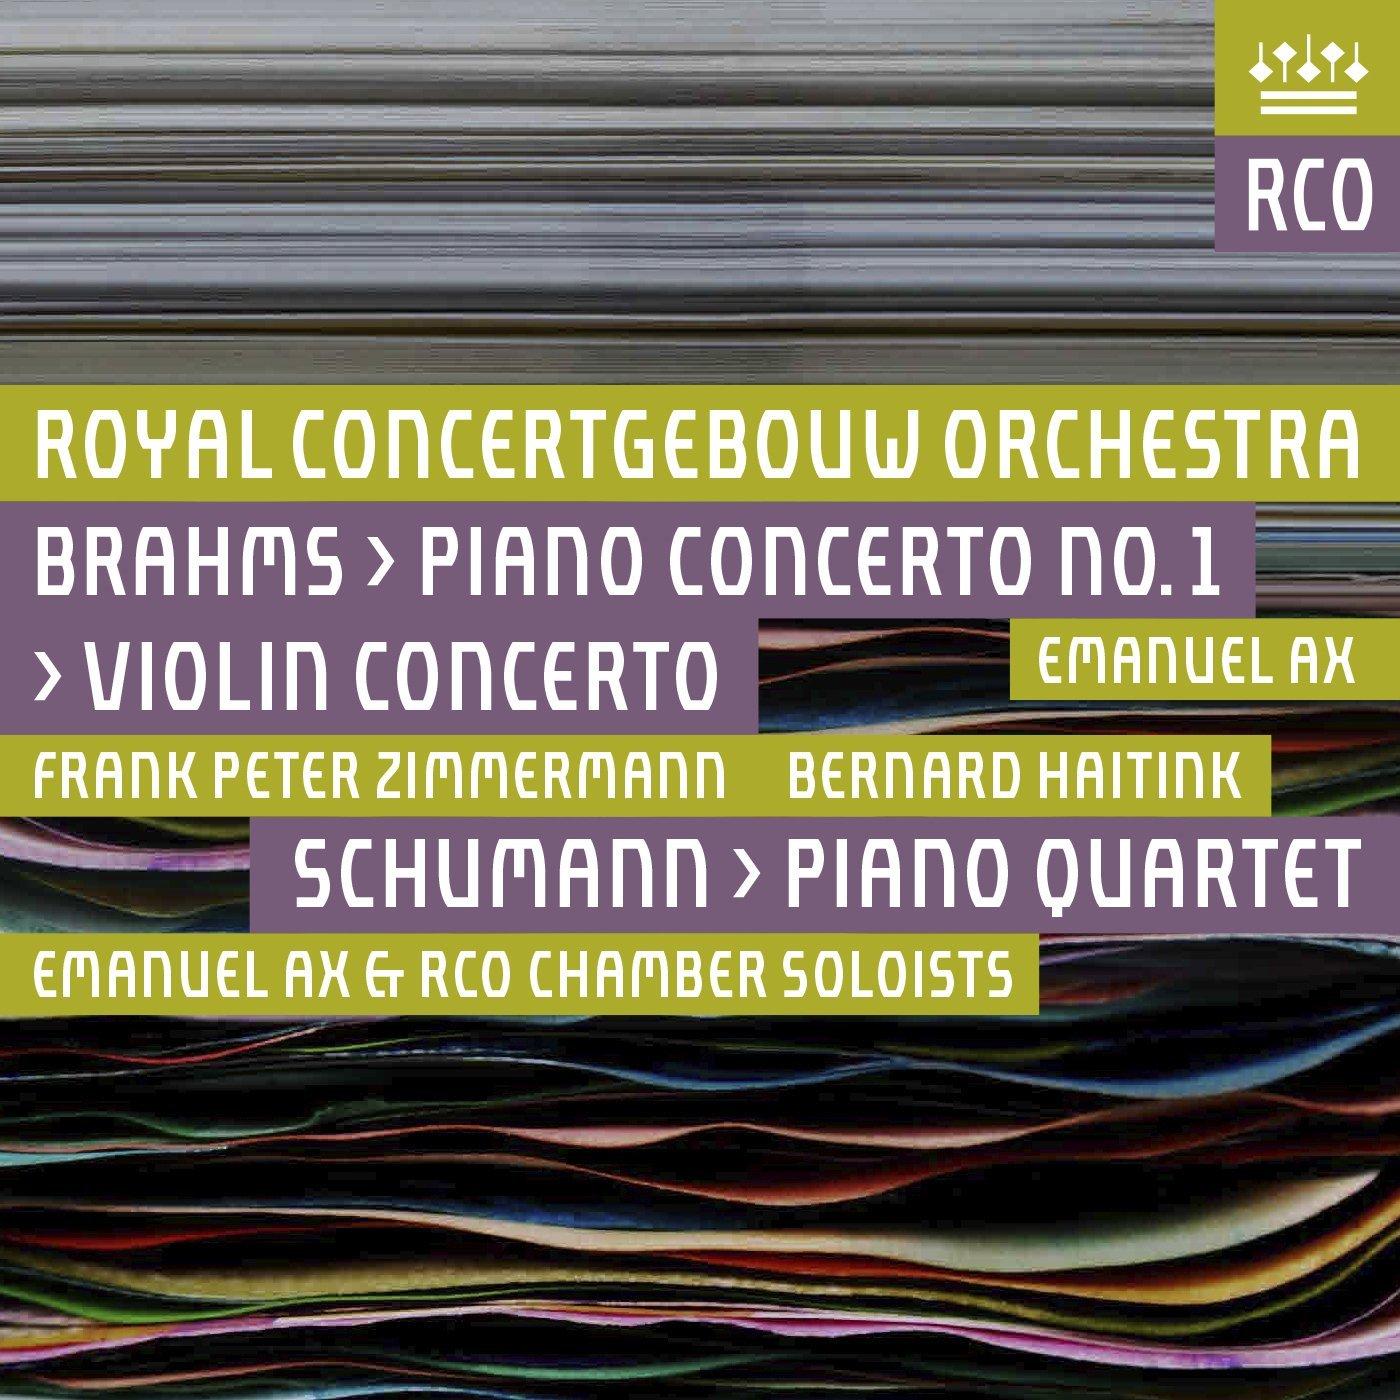 Bernard Haitnk Royal Concertgebouw Orchestra Brahm